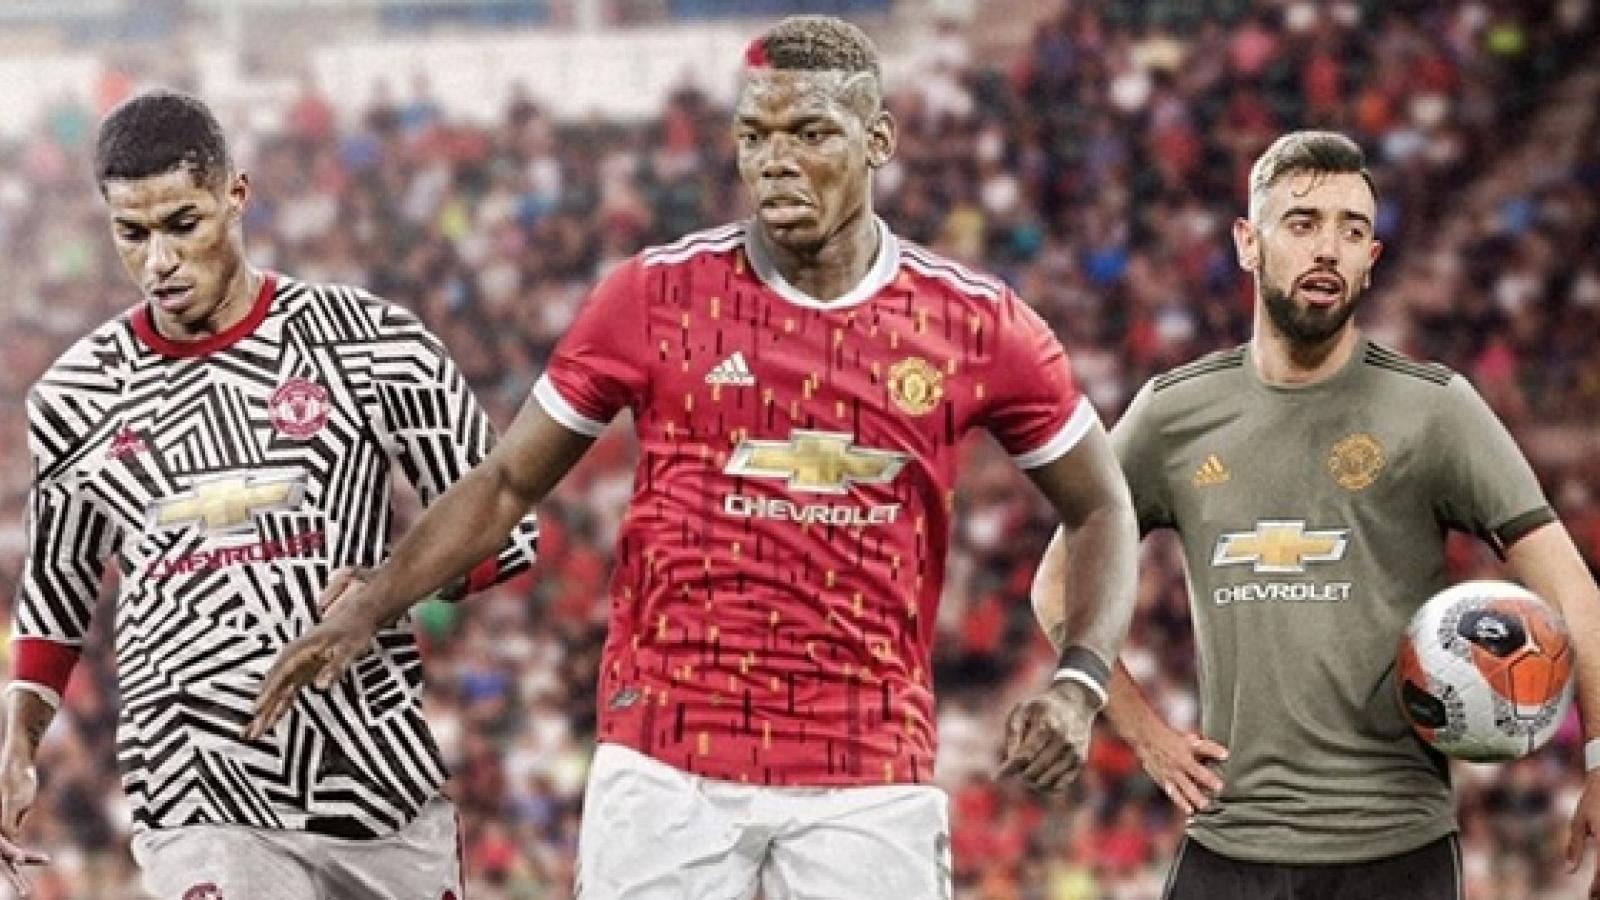 Lộ diện áo đấu mùa giải 2020/2021: Bayern được khen, MU bị chê